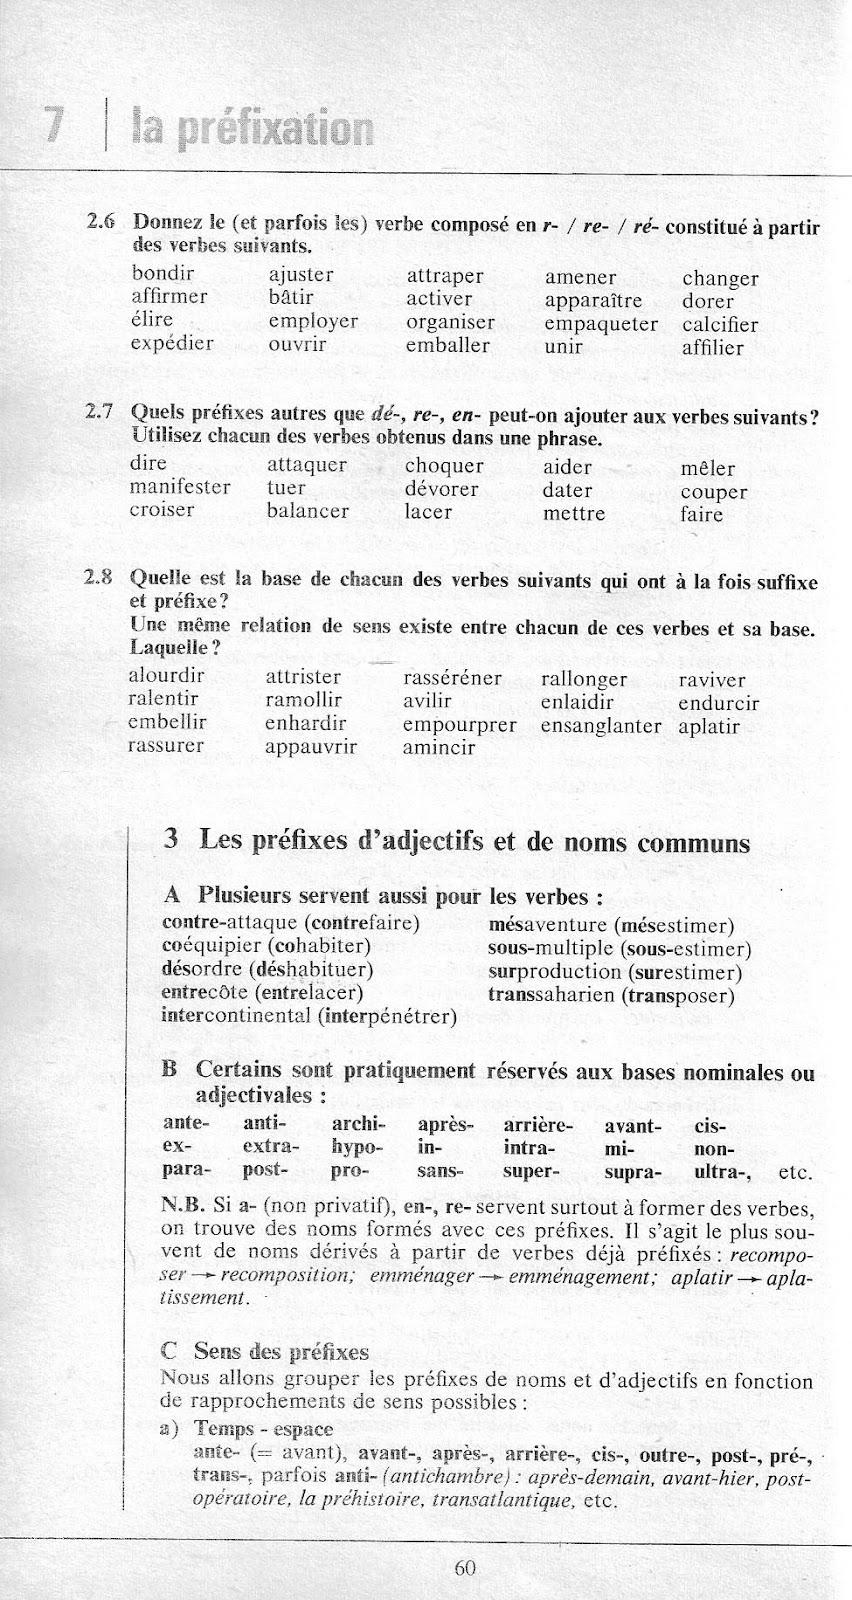 politique de datation Xerox